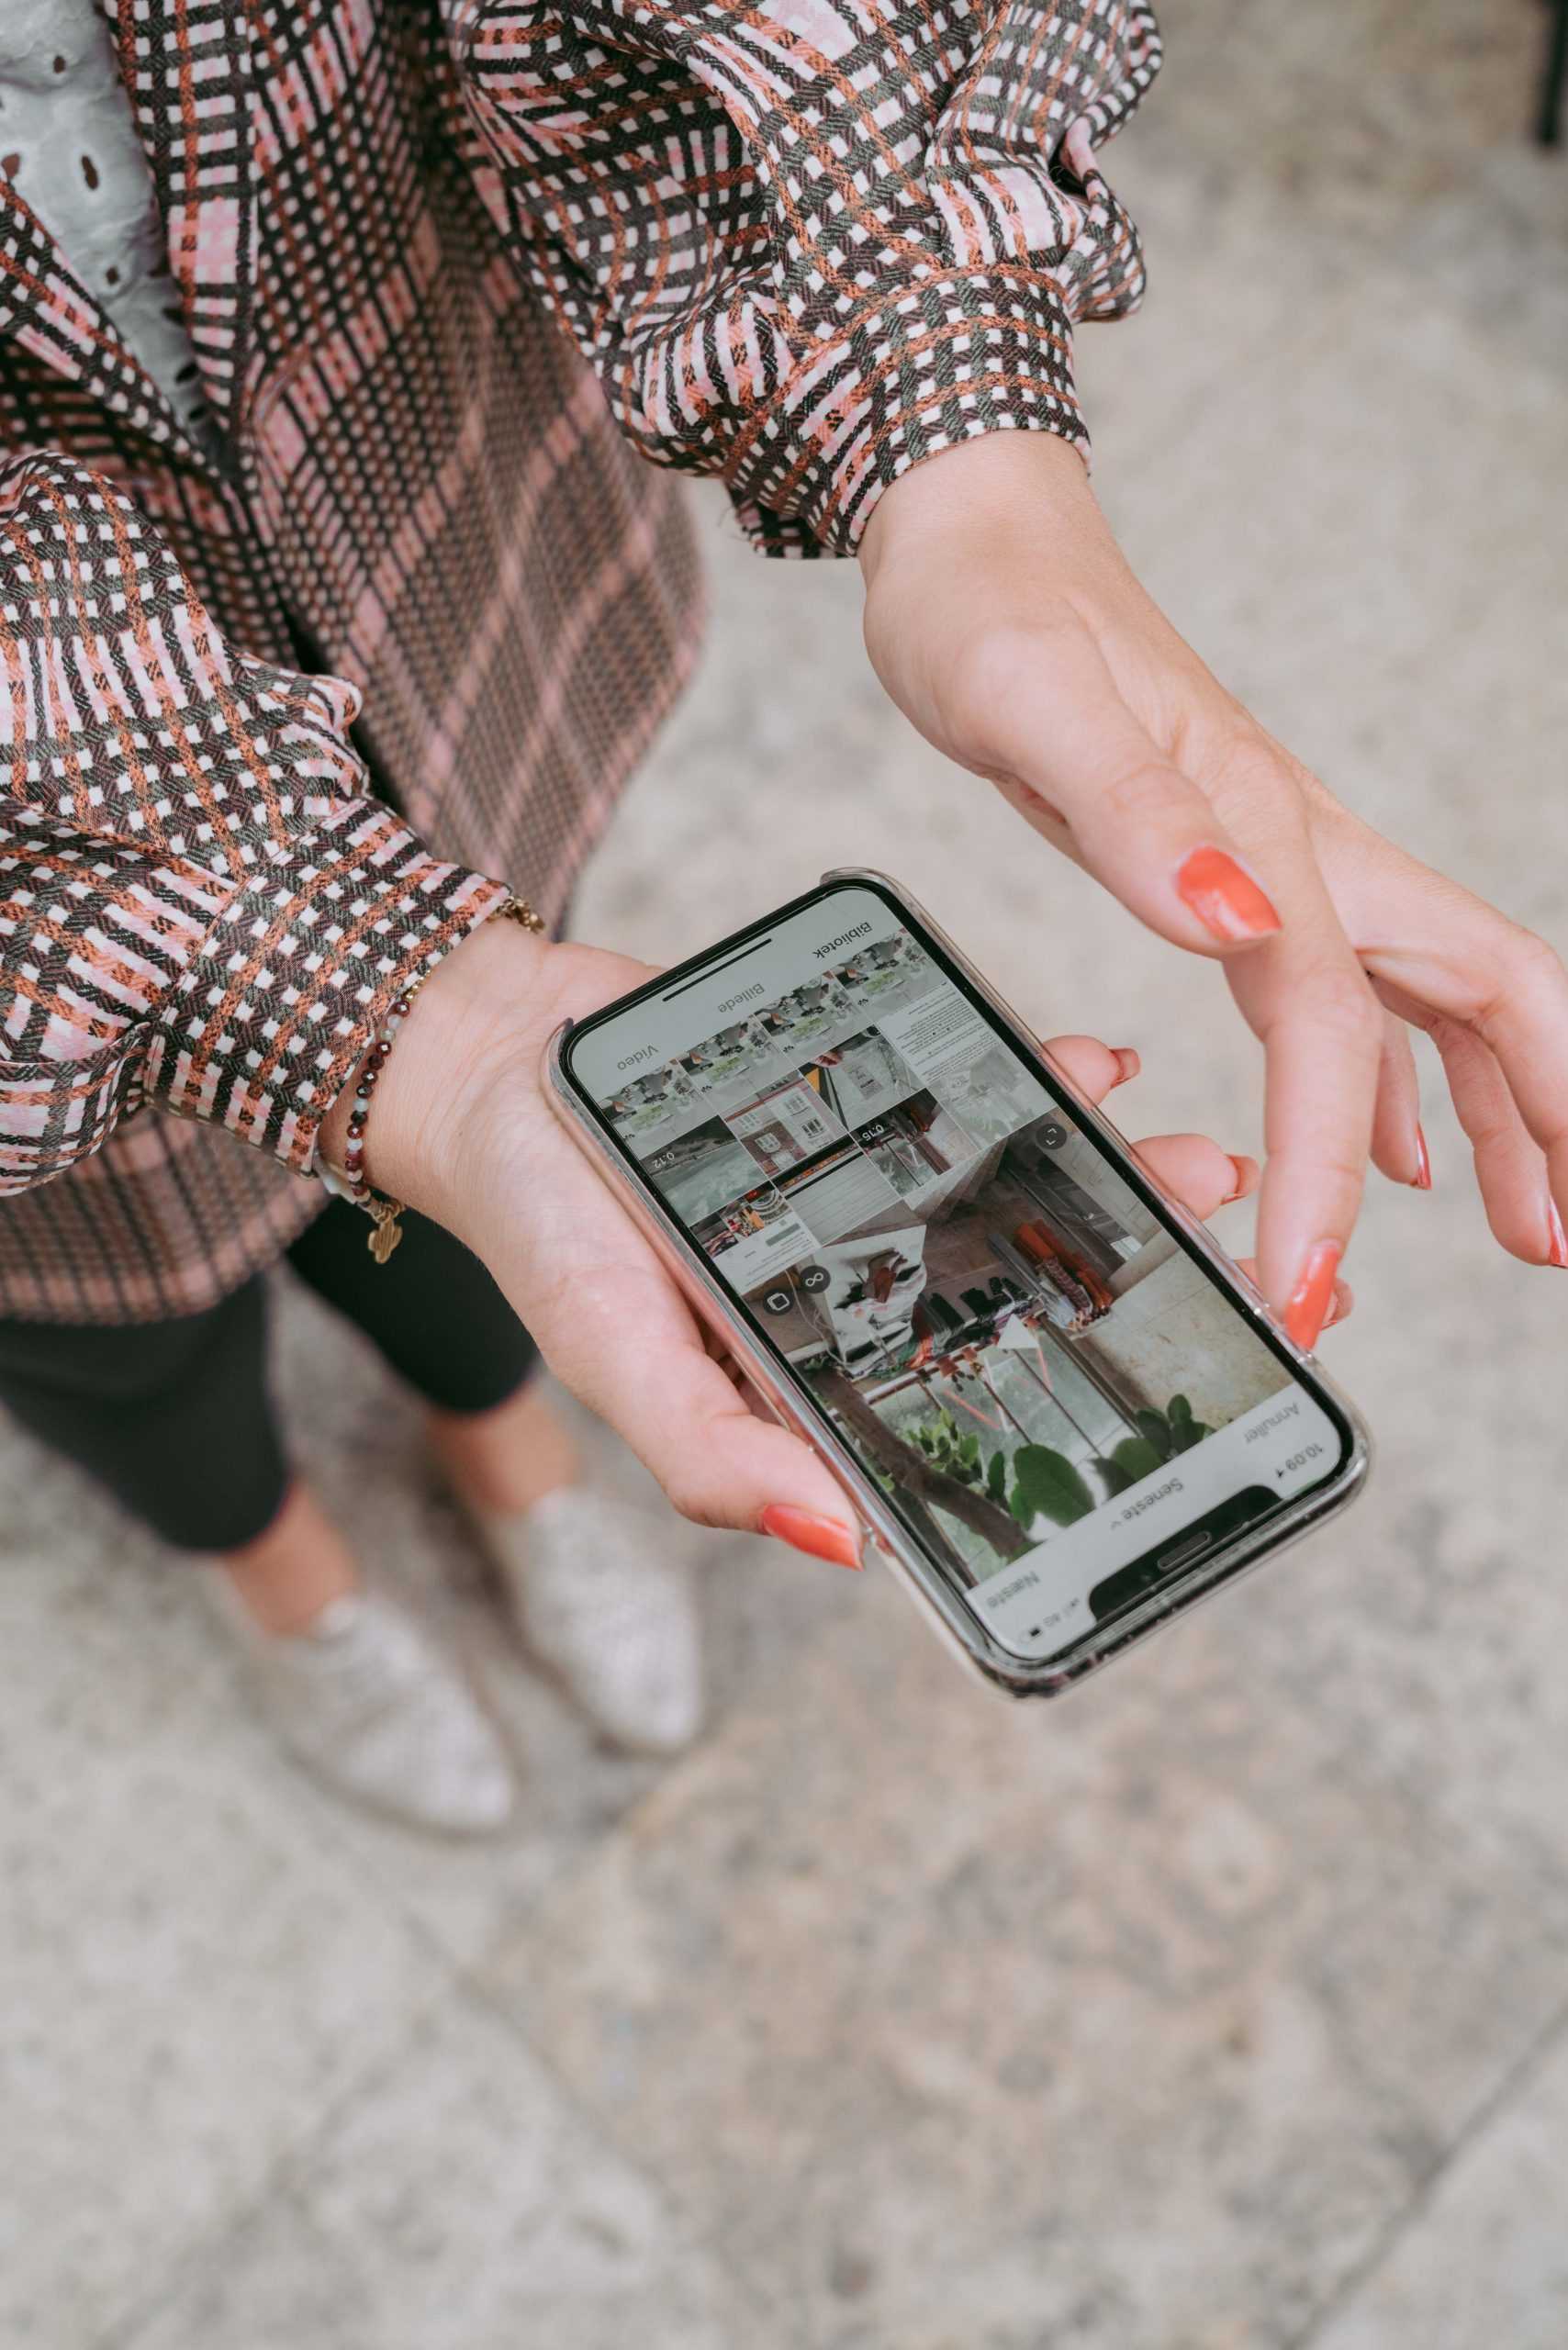 Kanalstrategi: Vækst din Instagram med Pinterest, Youtube og Facebook!